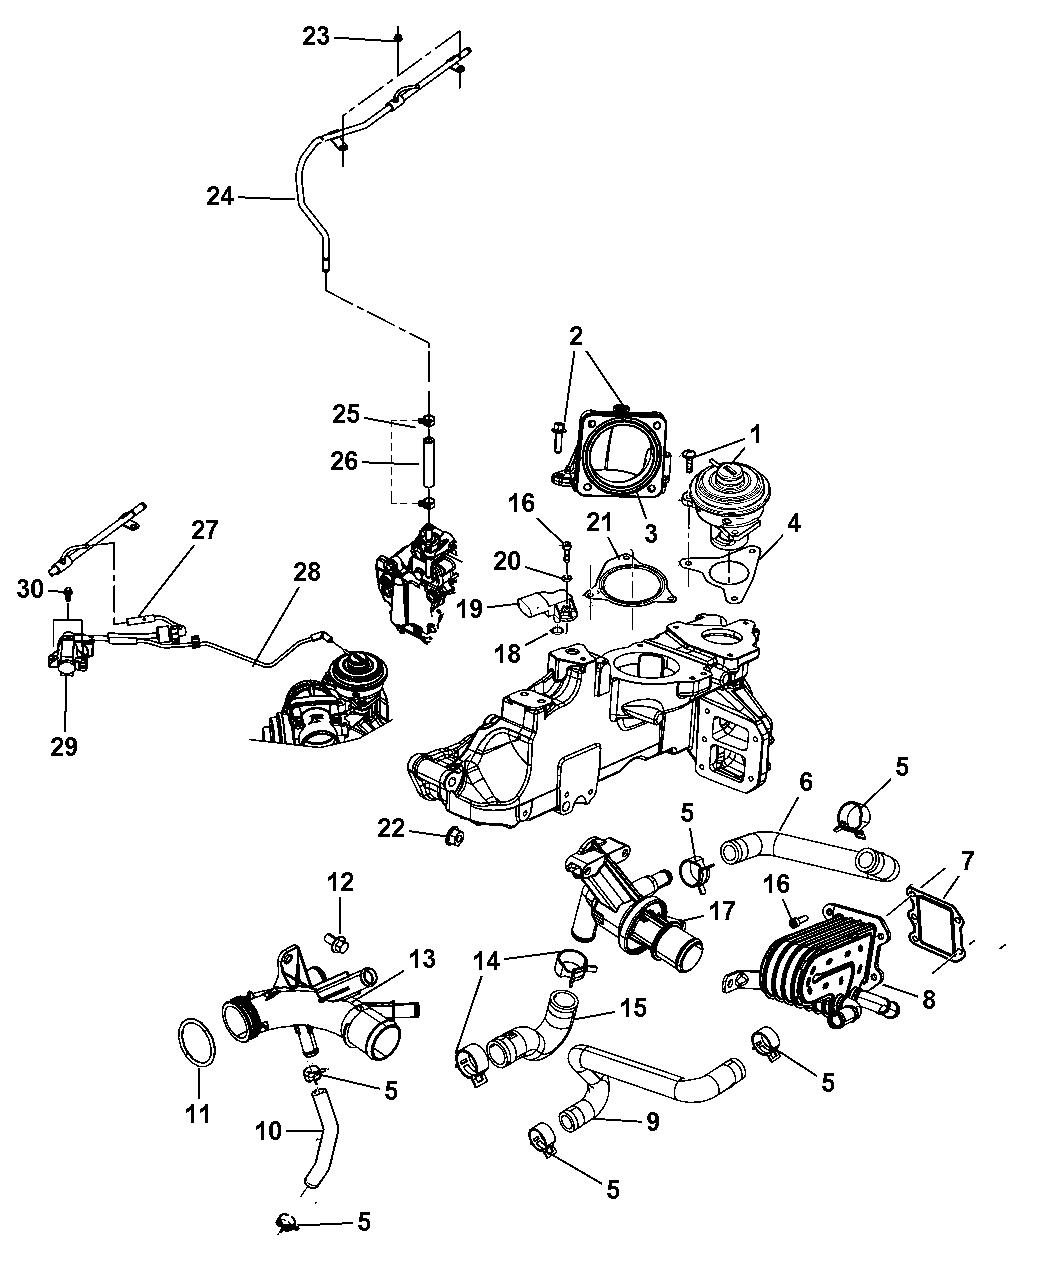 wrg 3746] 2008 jeep egr wiring2008 jeep wrangler egr valve \u0026 related thumbnail 1